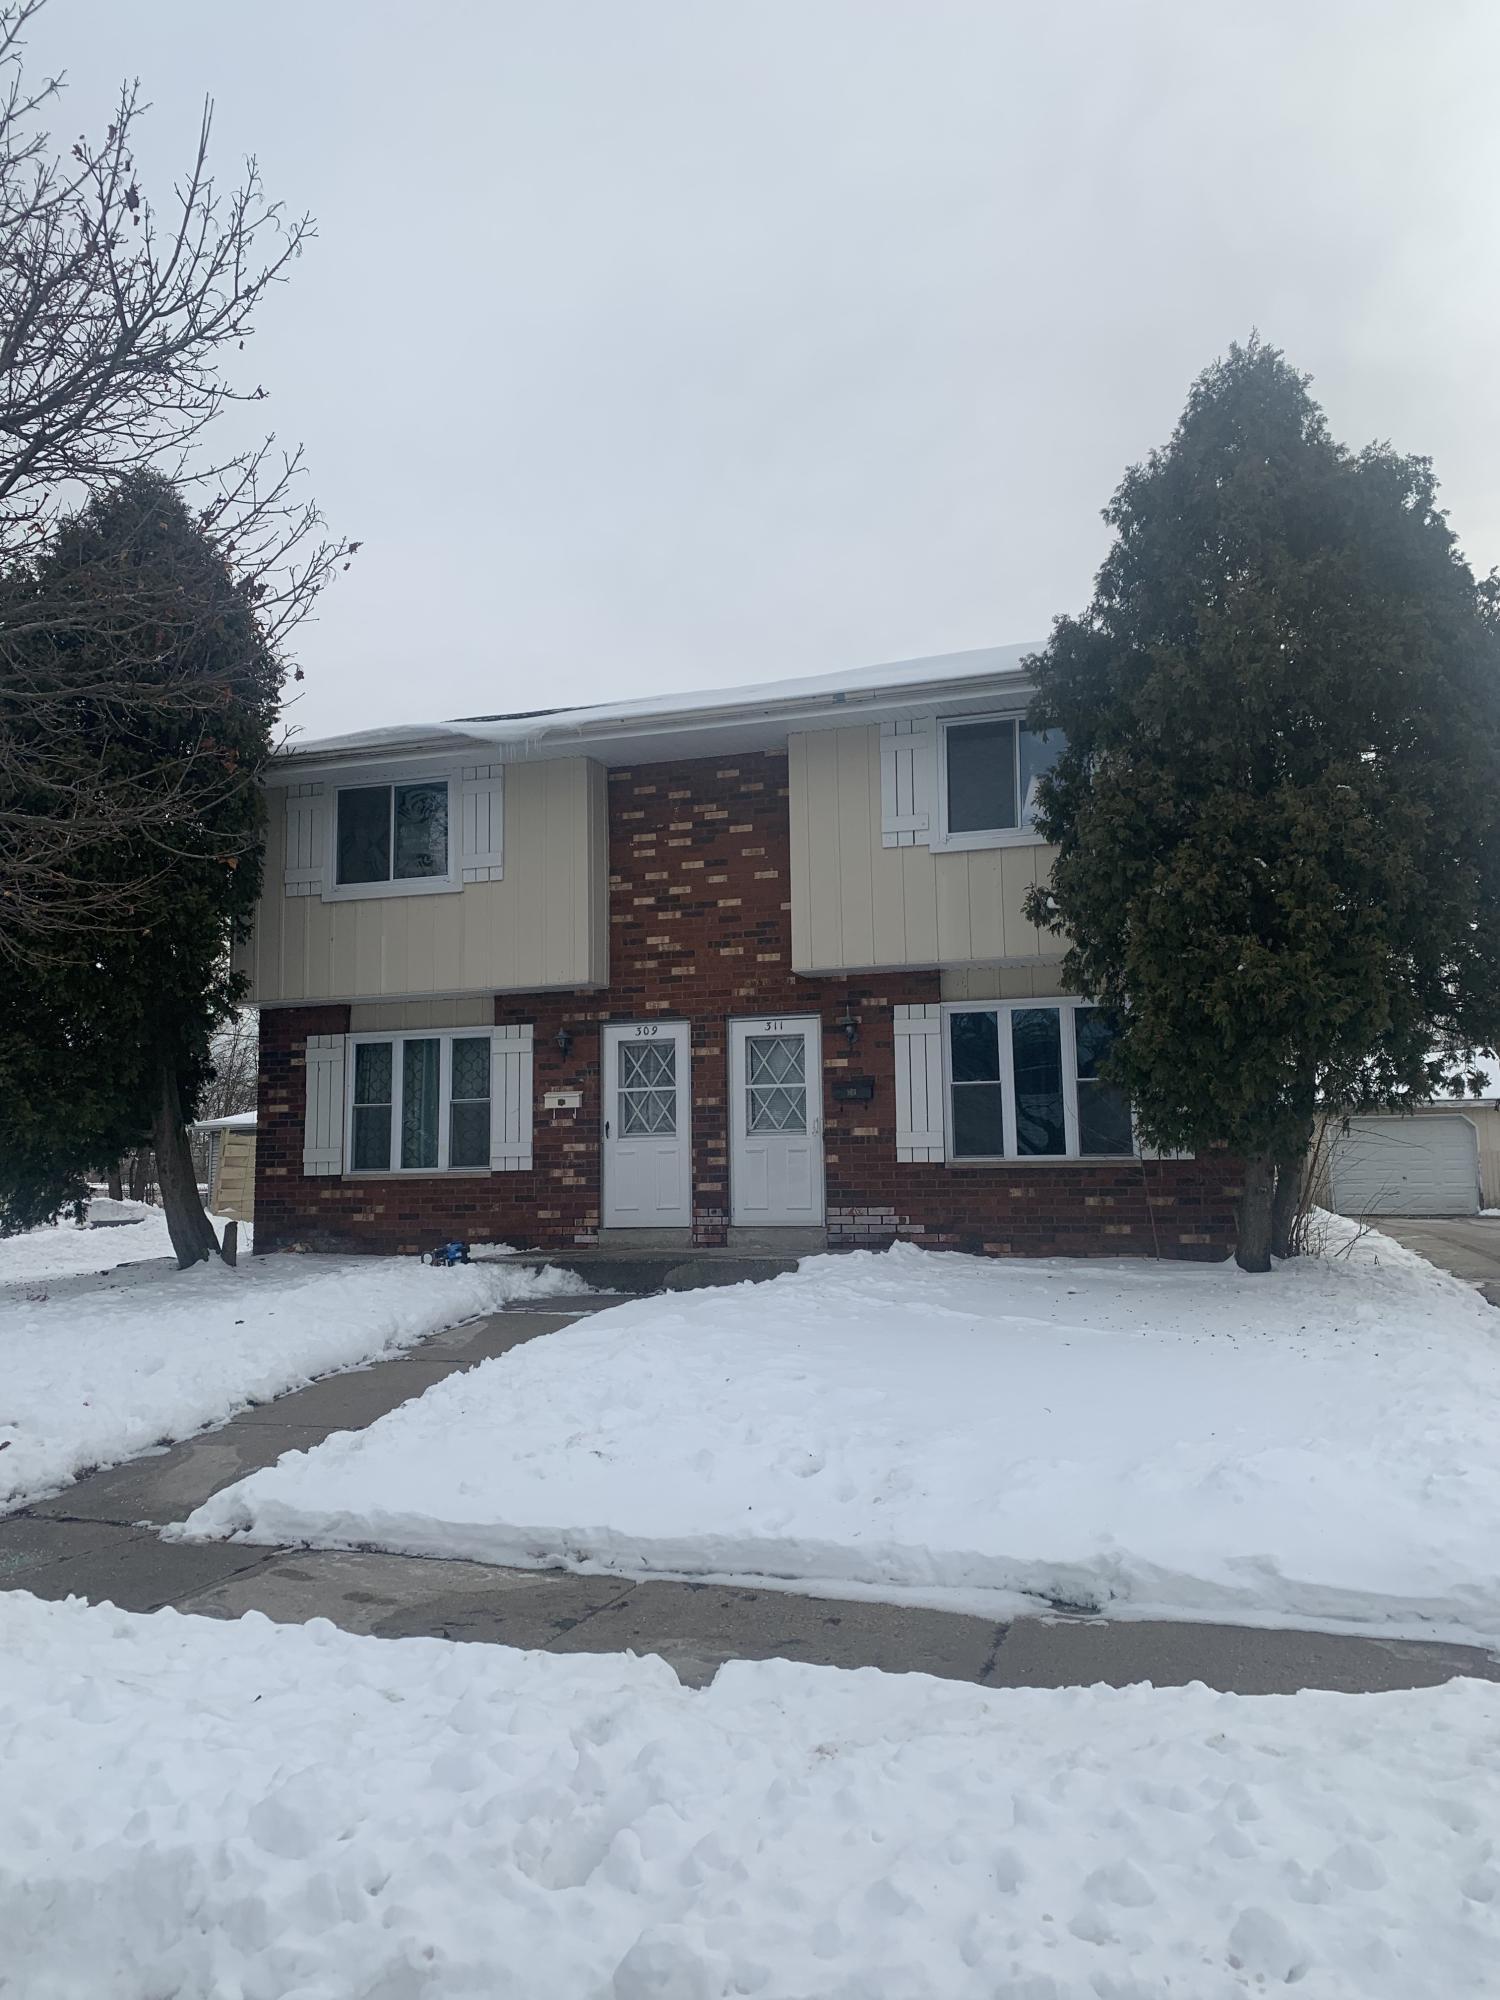 309 Darlene Dr, Waukesha, Wisconsin 53189, 3 Bedrooms Bedrooms, 6 Rooms Rooms,1 BathroomBathrooms,Two-Family,For Sale,Darlene Dr,1,1674019